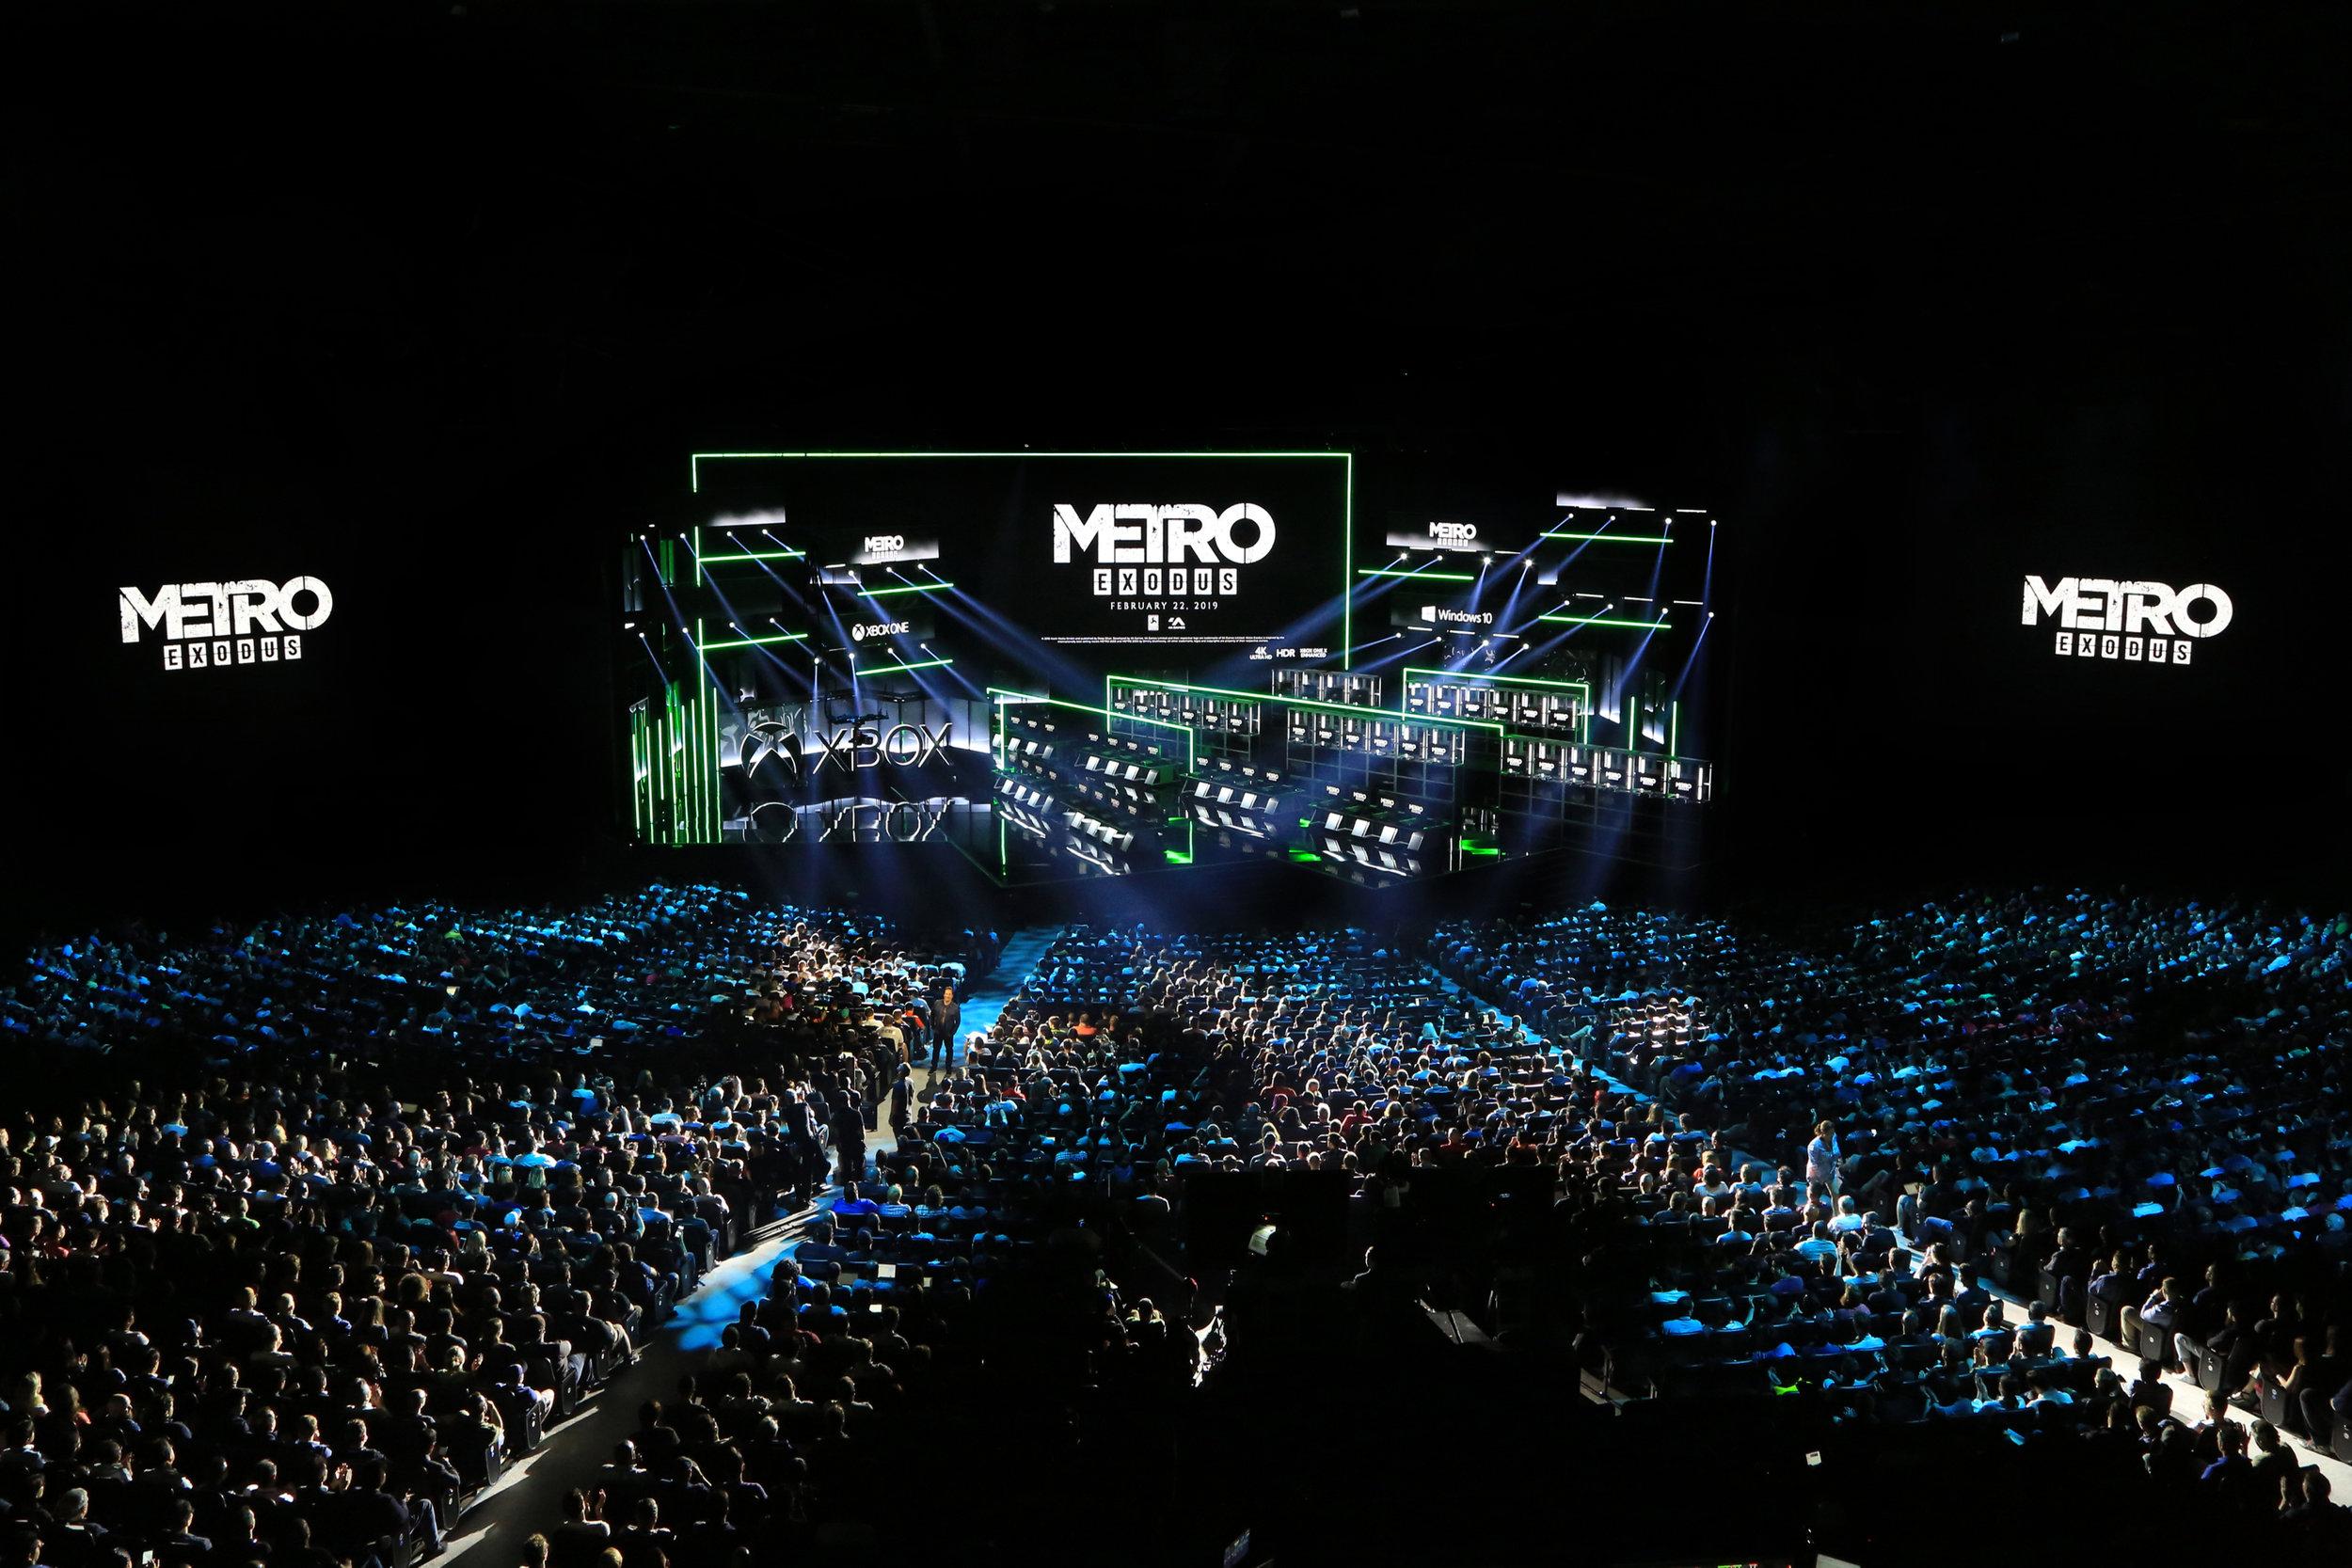 Xbox E3 Media Briefing 2018